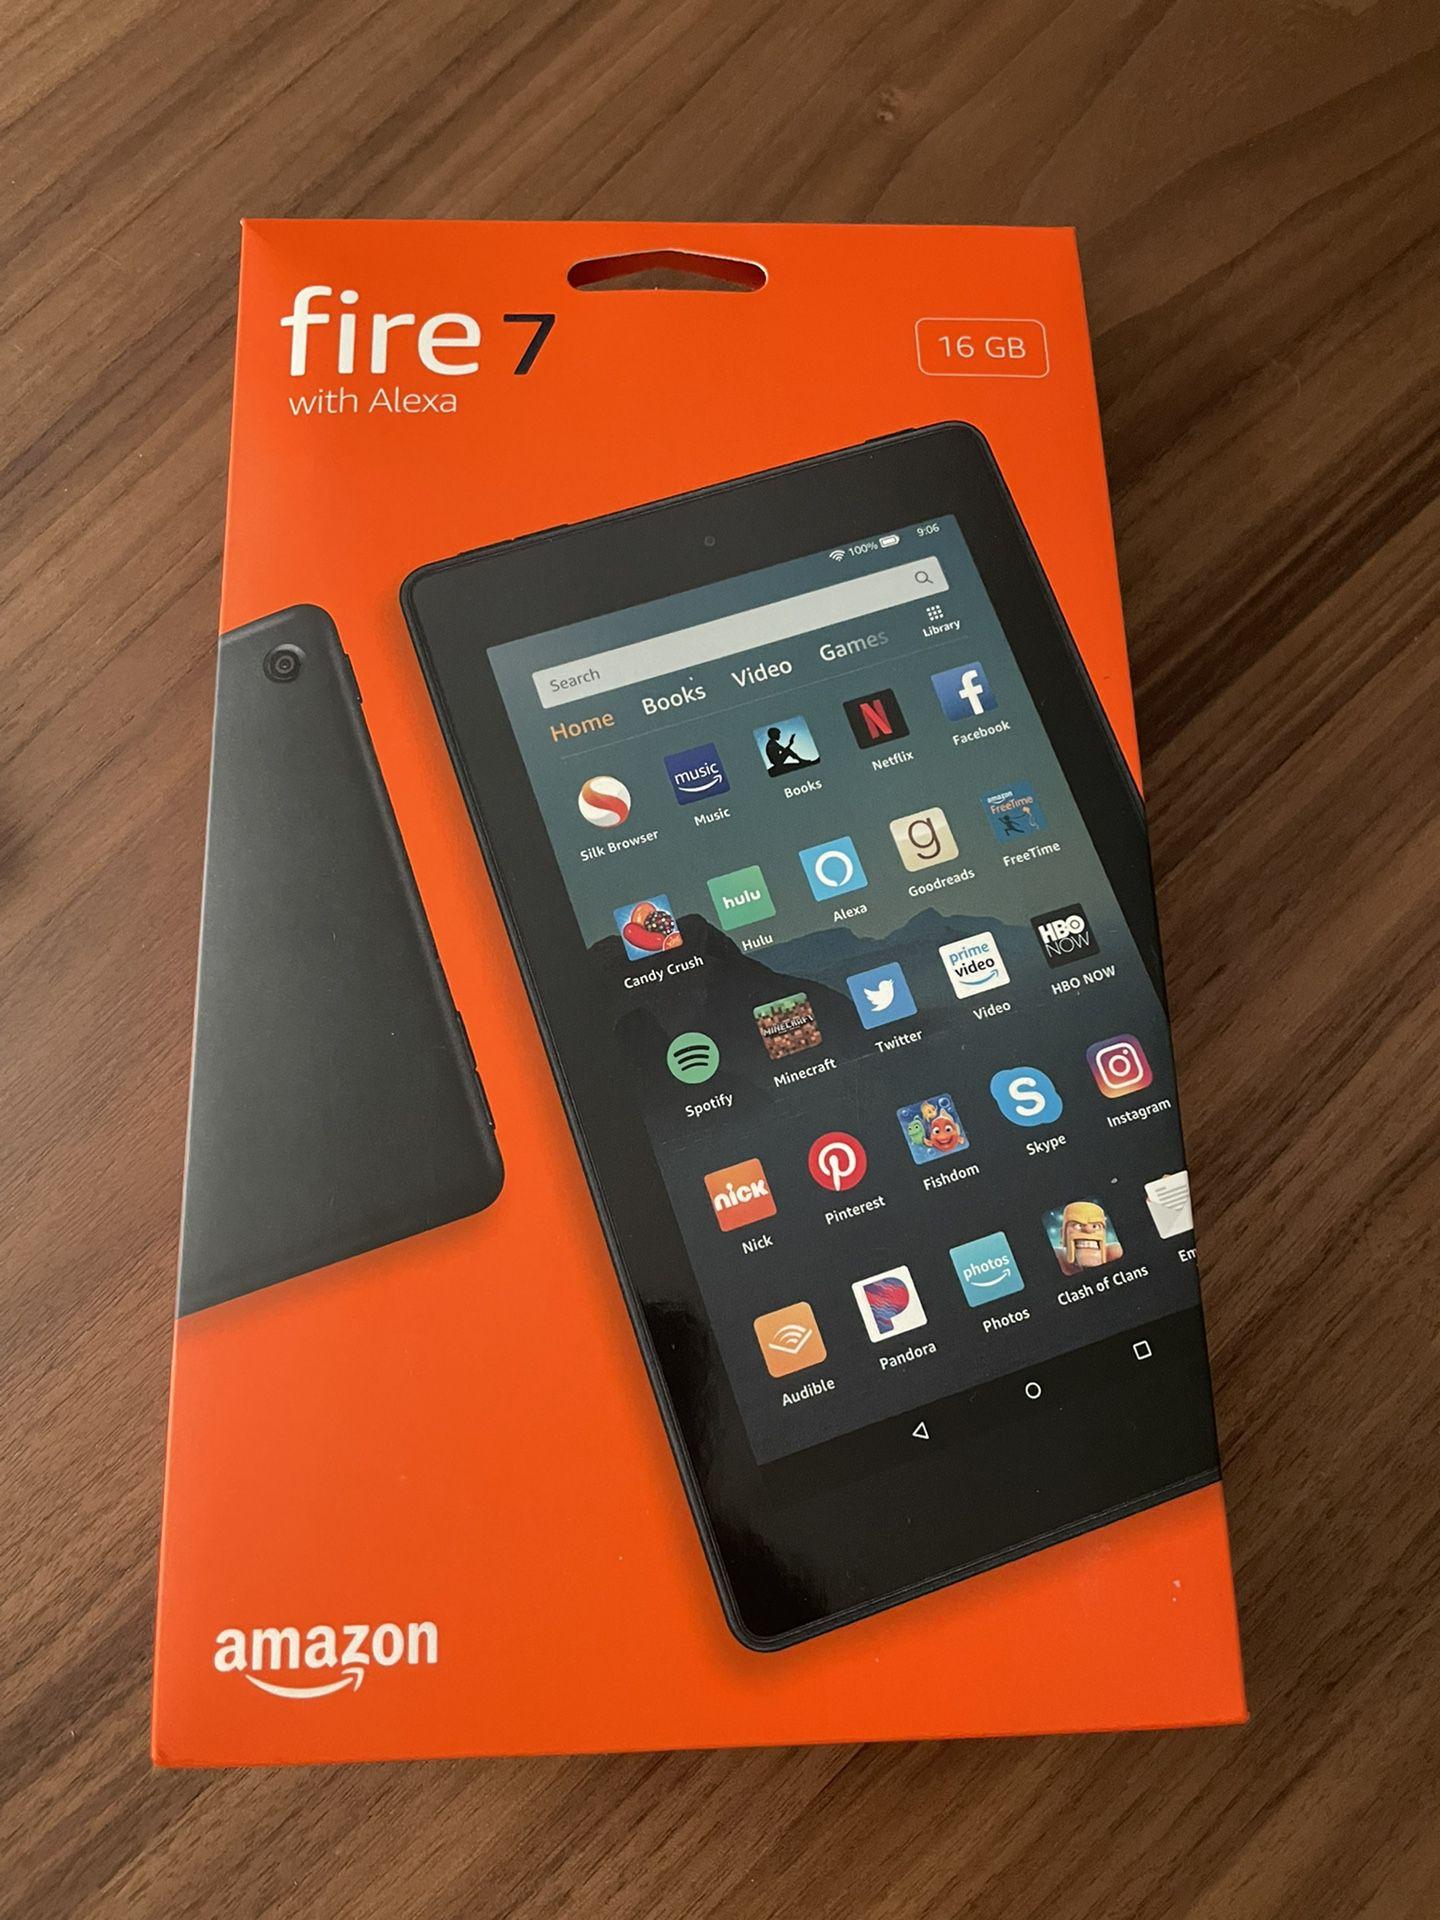 Amazon Fire Tablet, Fire 7